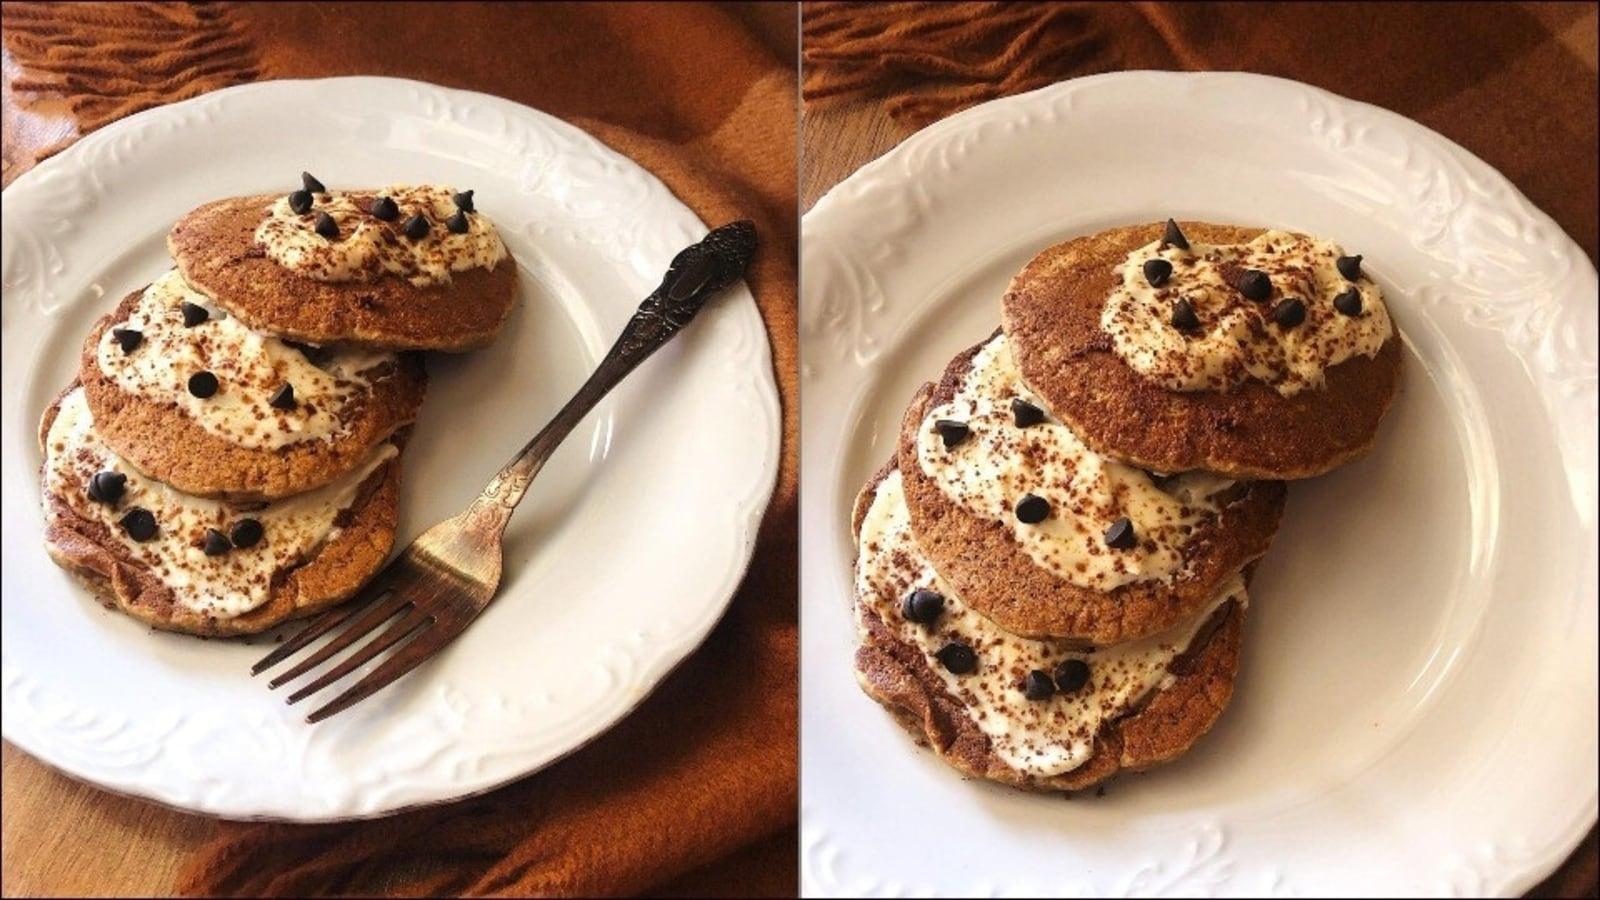 Recipe: Wrap up your Sunday or welcome Monday with pancakes tiramisu style